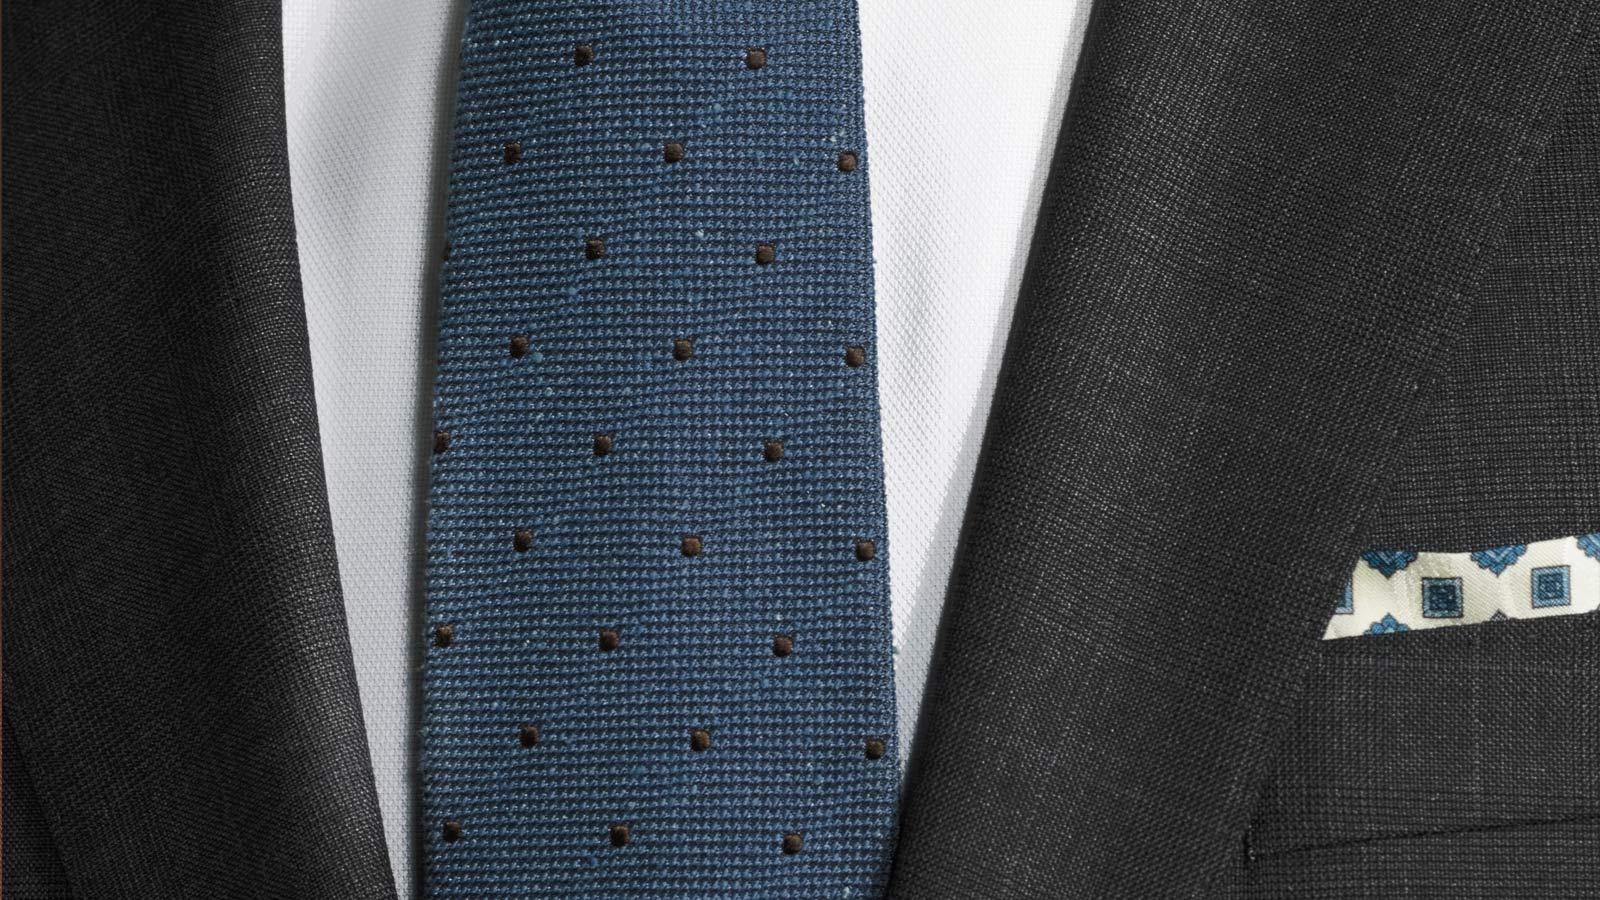 Premium Charcoal Plaid Suit - slider image 1